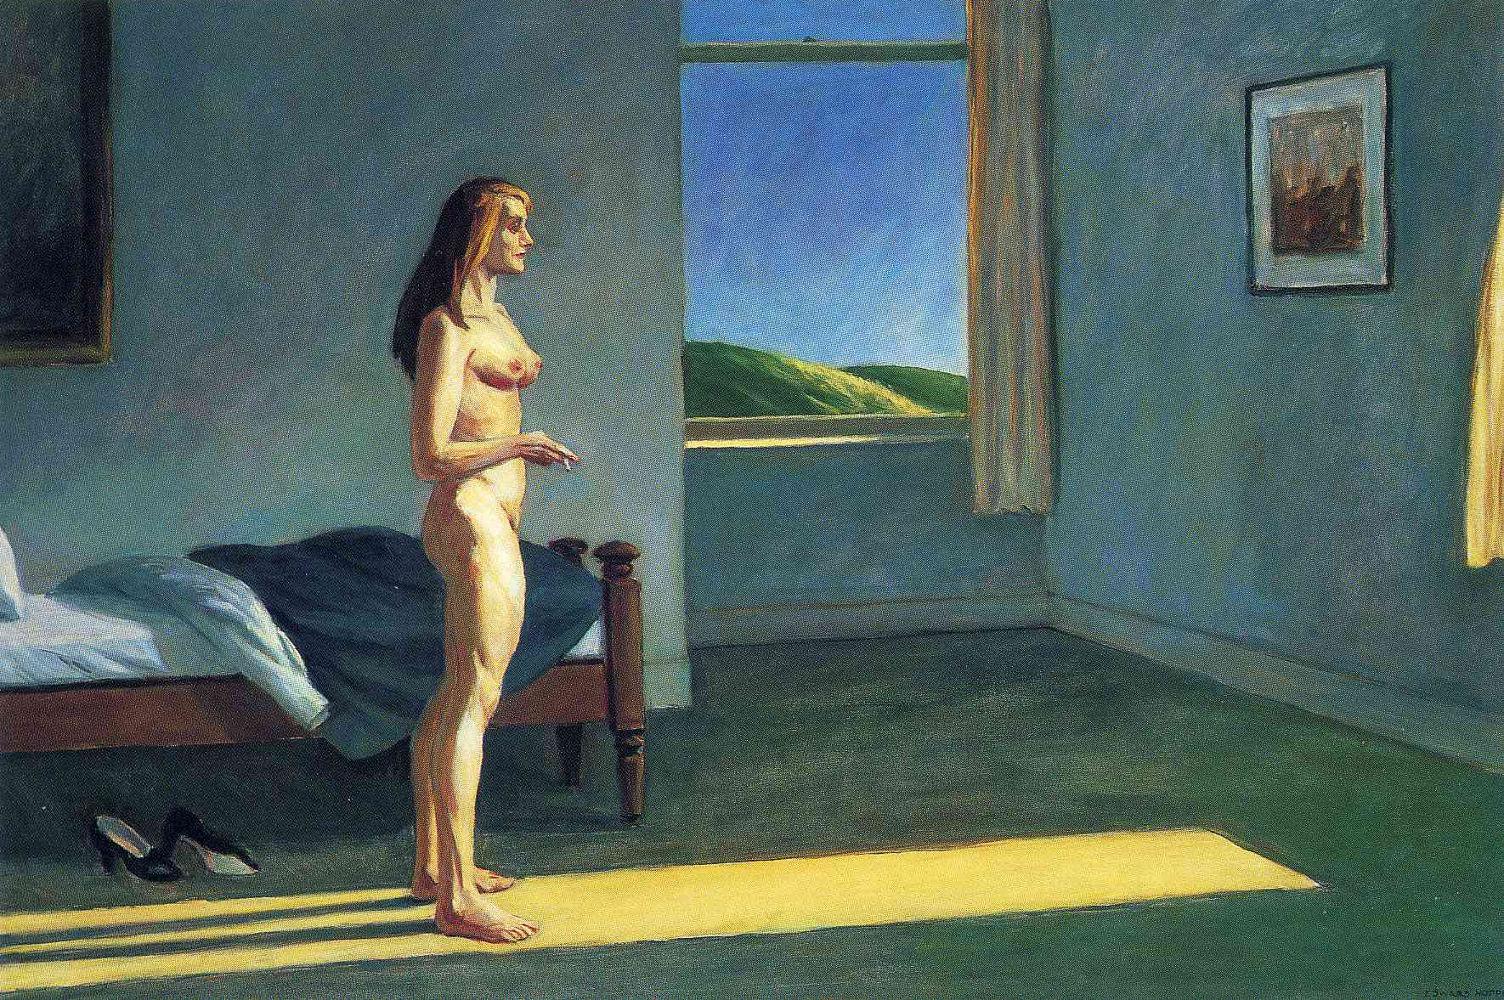 Woman in the Sun (1961), Μουσείο Γουίτνεϊ της Νέας Υόρκης